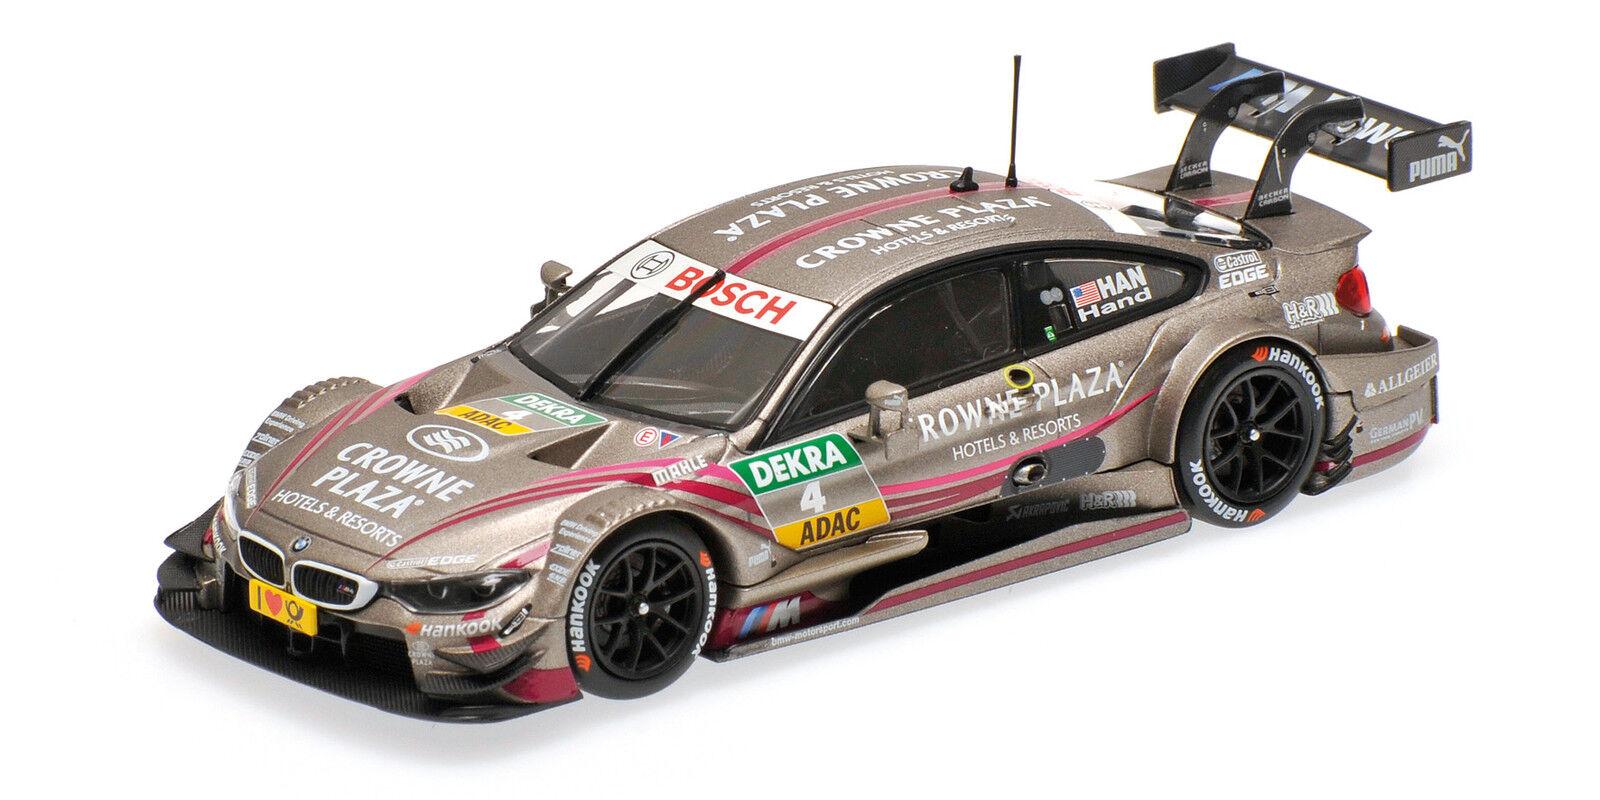 BMW m4 f82 Team RBM Joey mano DTM 2014 1:43 MODEL MINICHAMPS